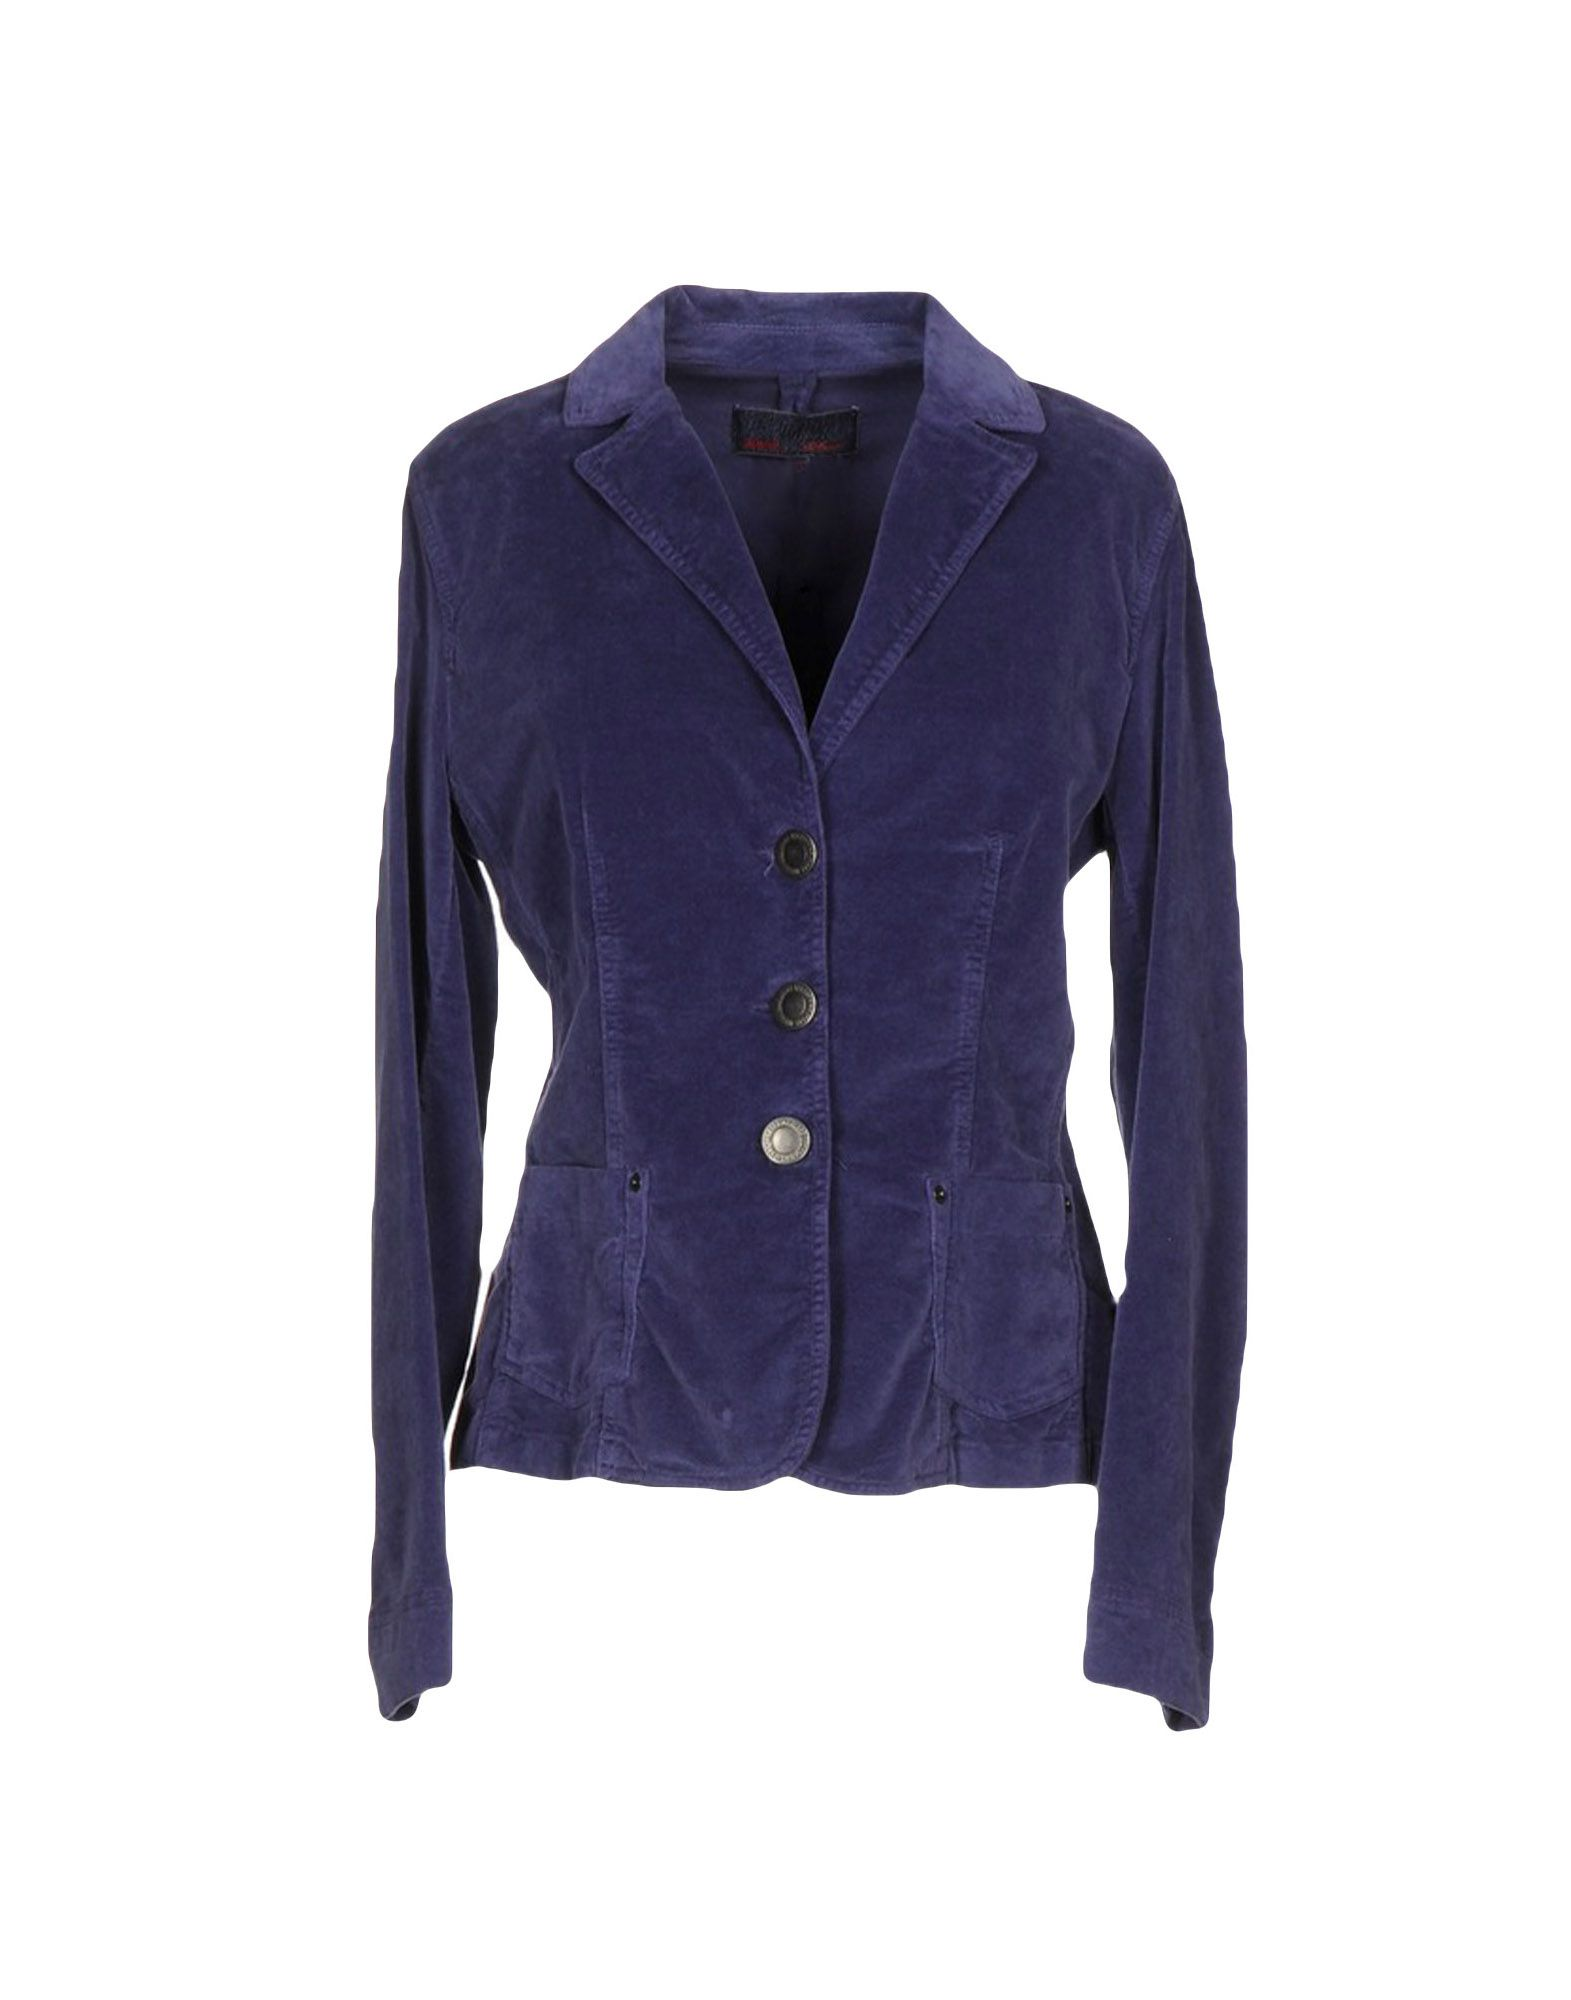 JEANS LES COPAINS Damen Jackett Farbe Violett Größe 5 jetztbilligerkaufen